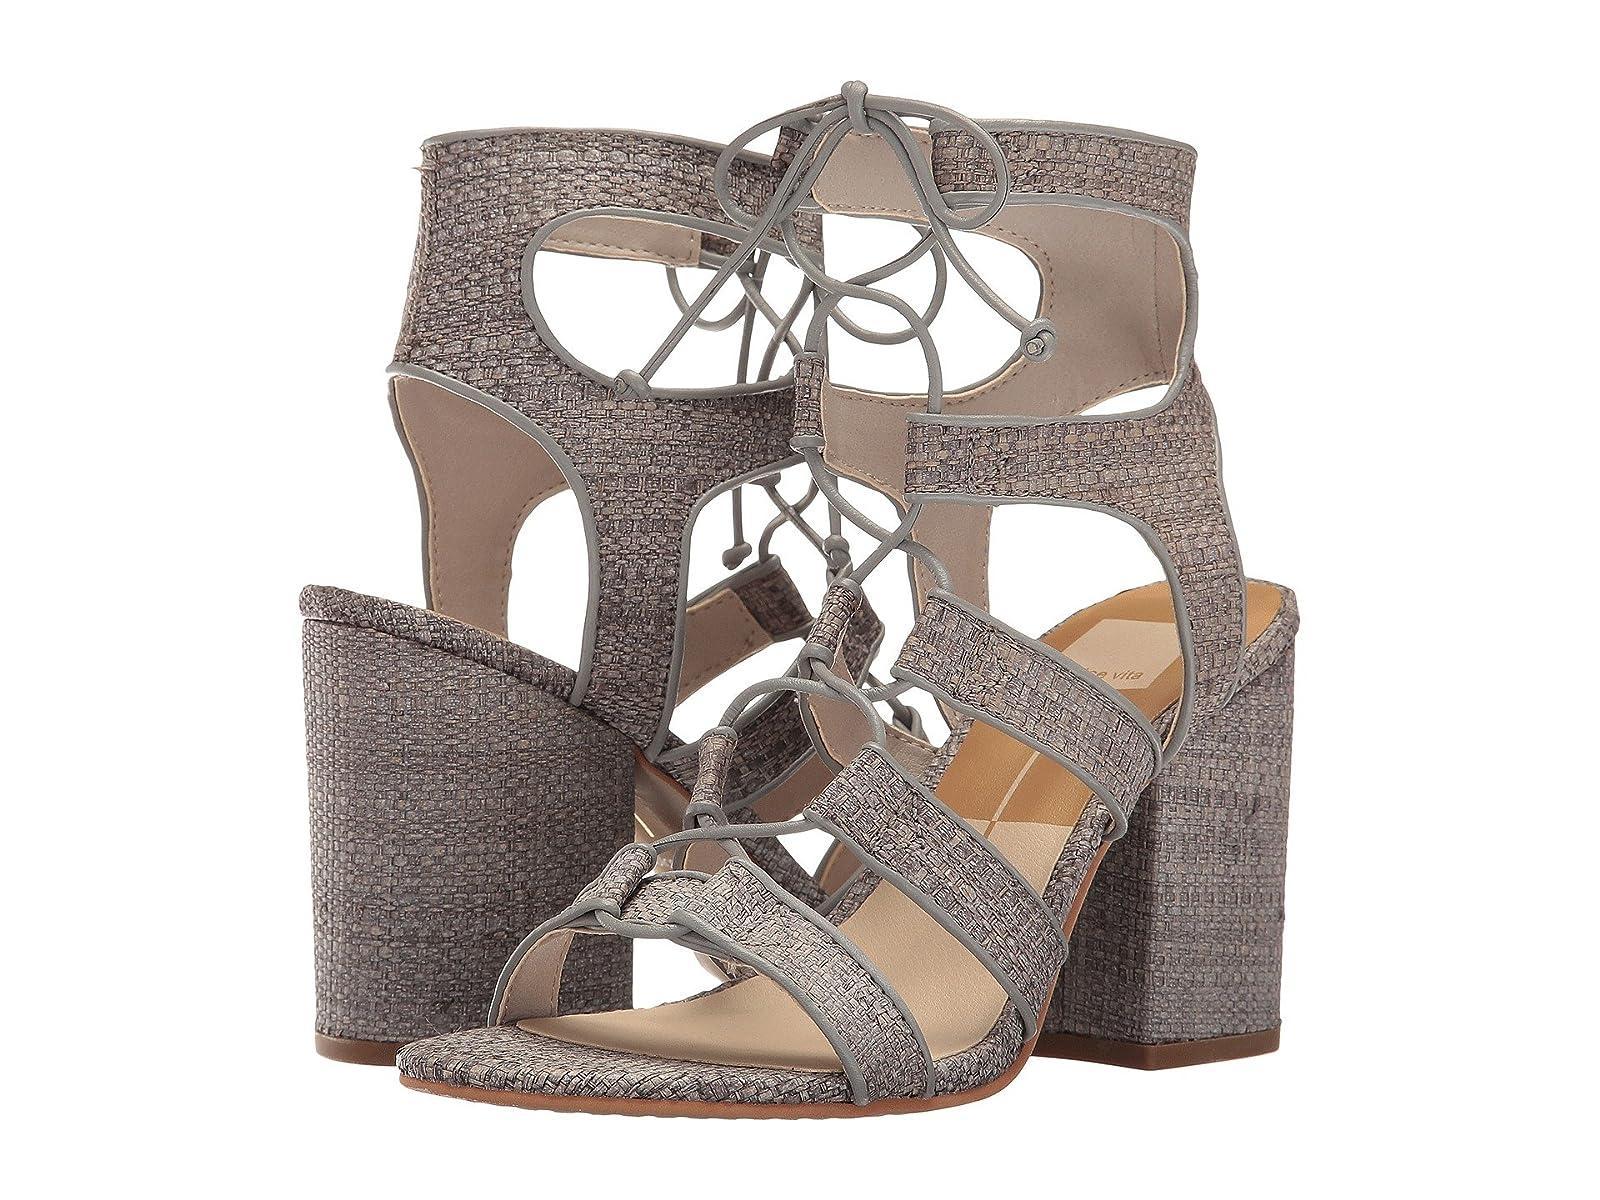 Dolce Vita EvaCheap and distinctive eye-catching shoes